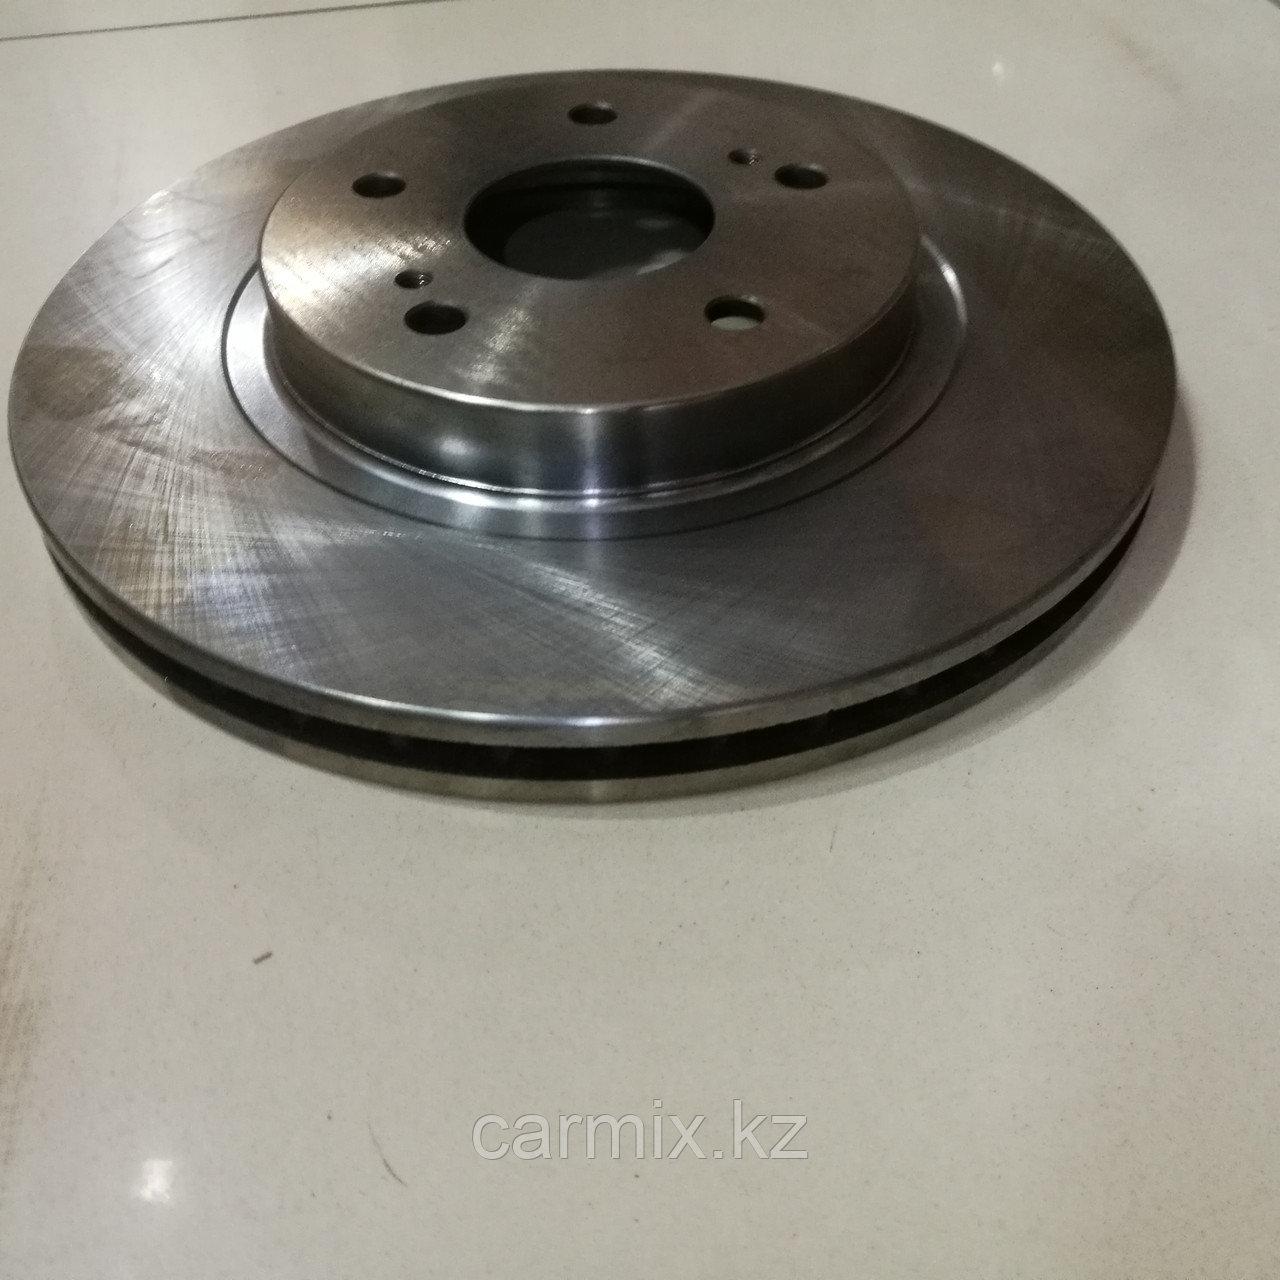 Тормозной диск передний SUZUKI GRAND VITARA 2005-2012, DODA, CHINA